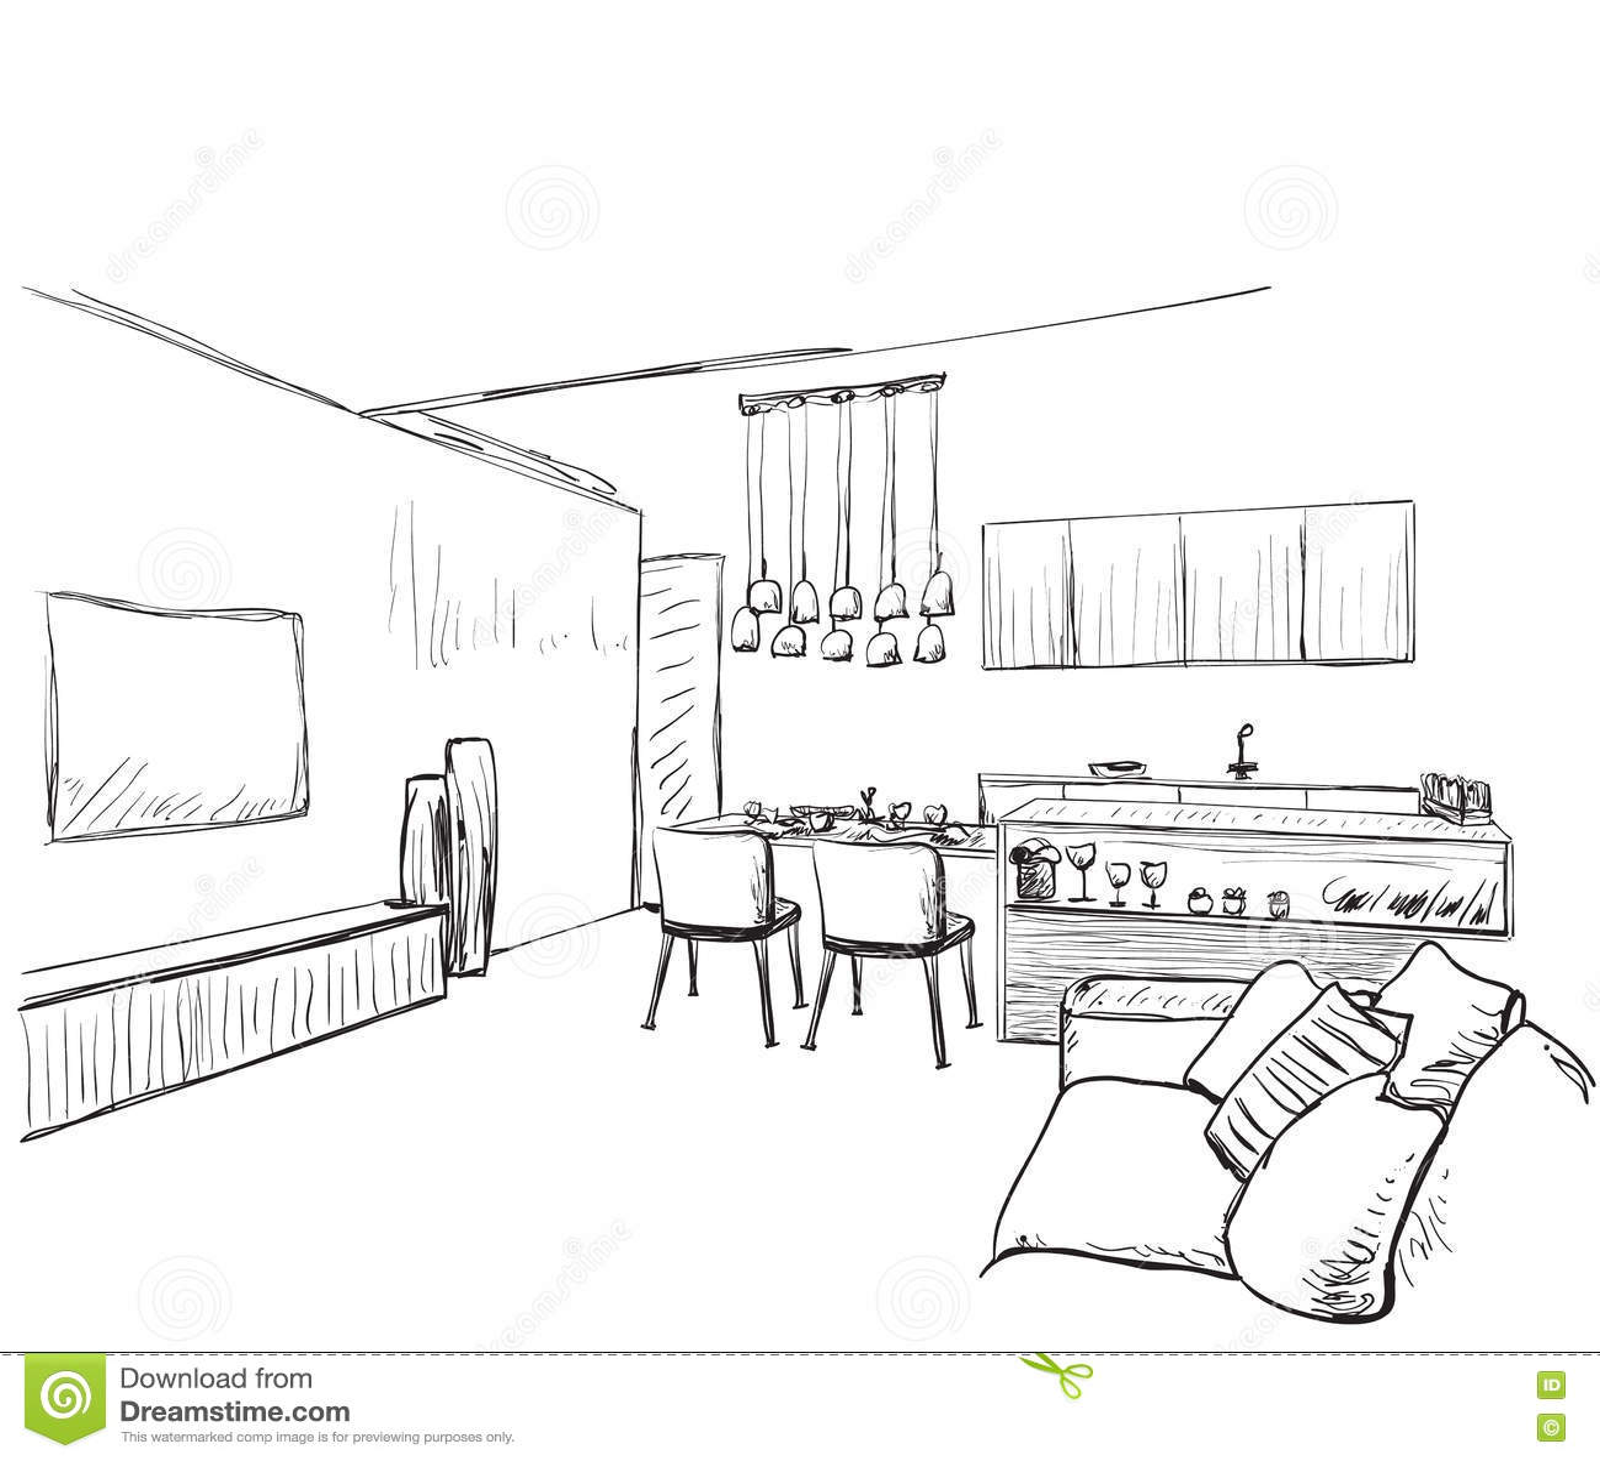 Download modern interior room sketch hand drawn furniture stock vector illustration of salon